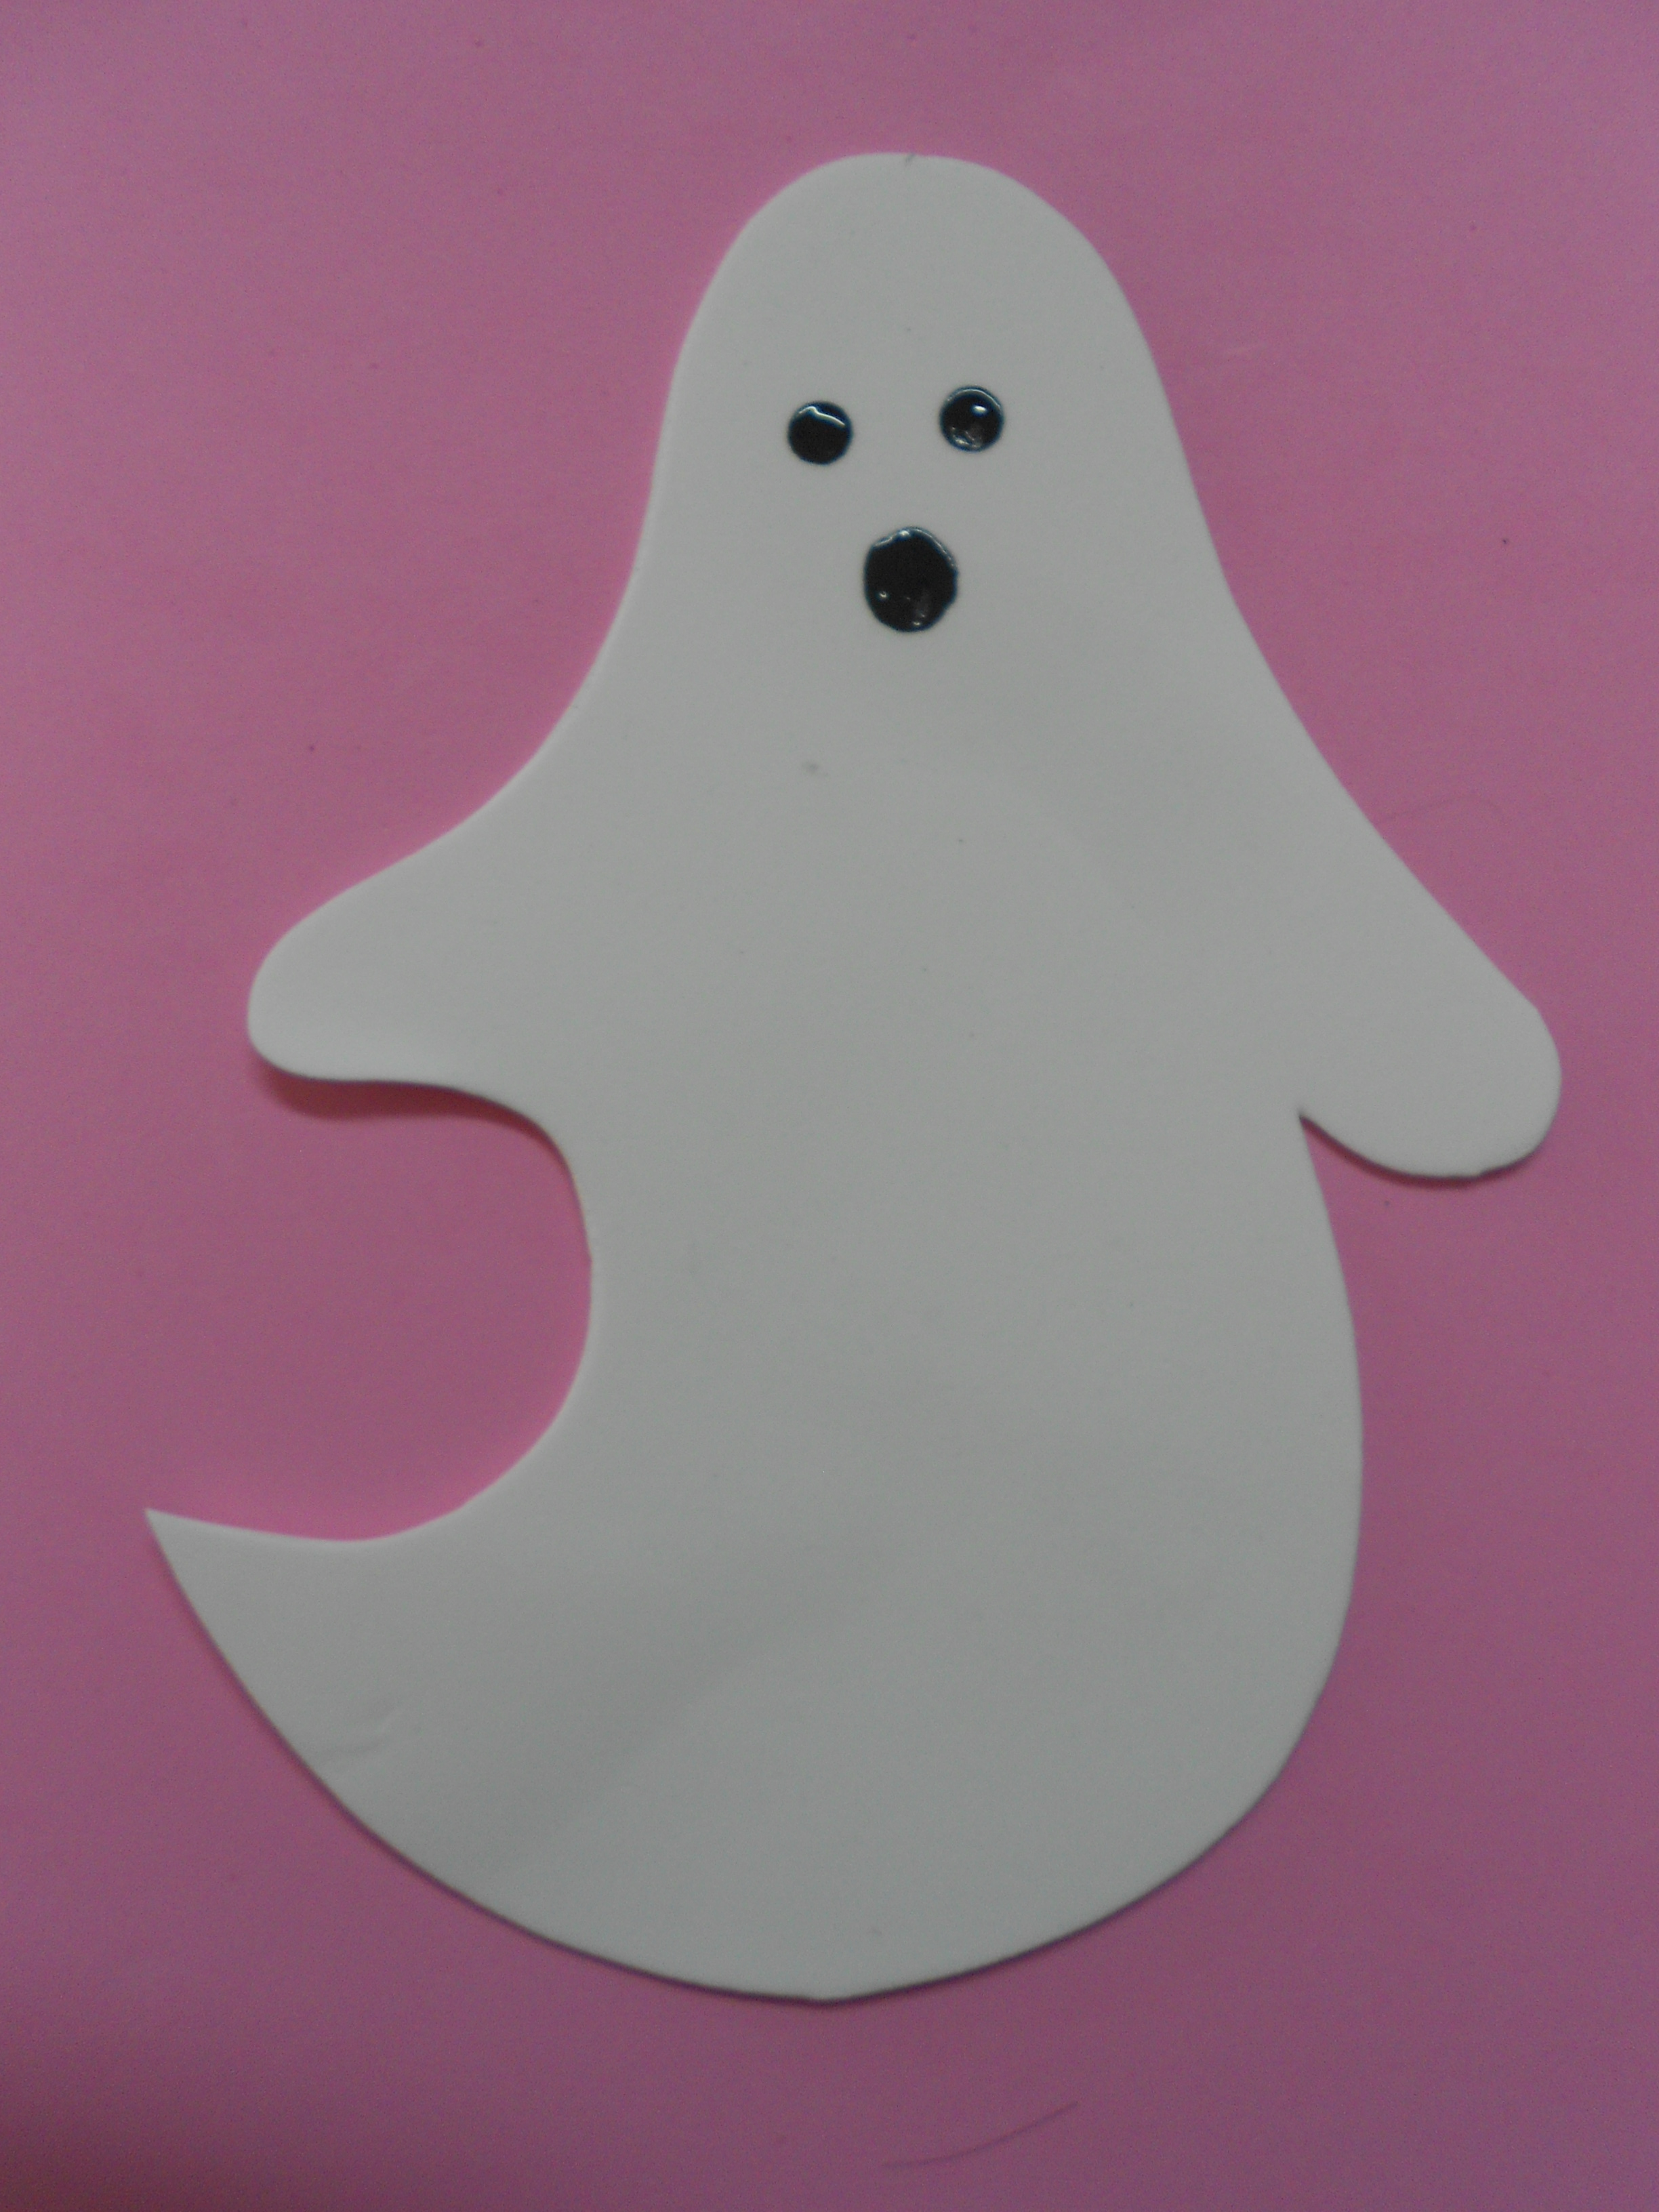 Aplique De Fantasma Grande Halloween No Elo7 Petit Gateau